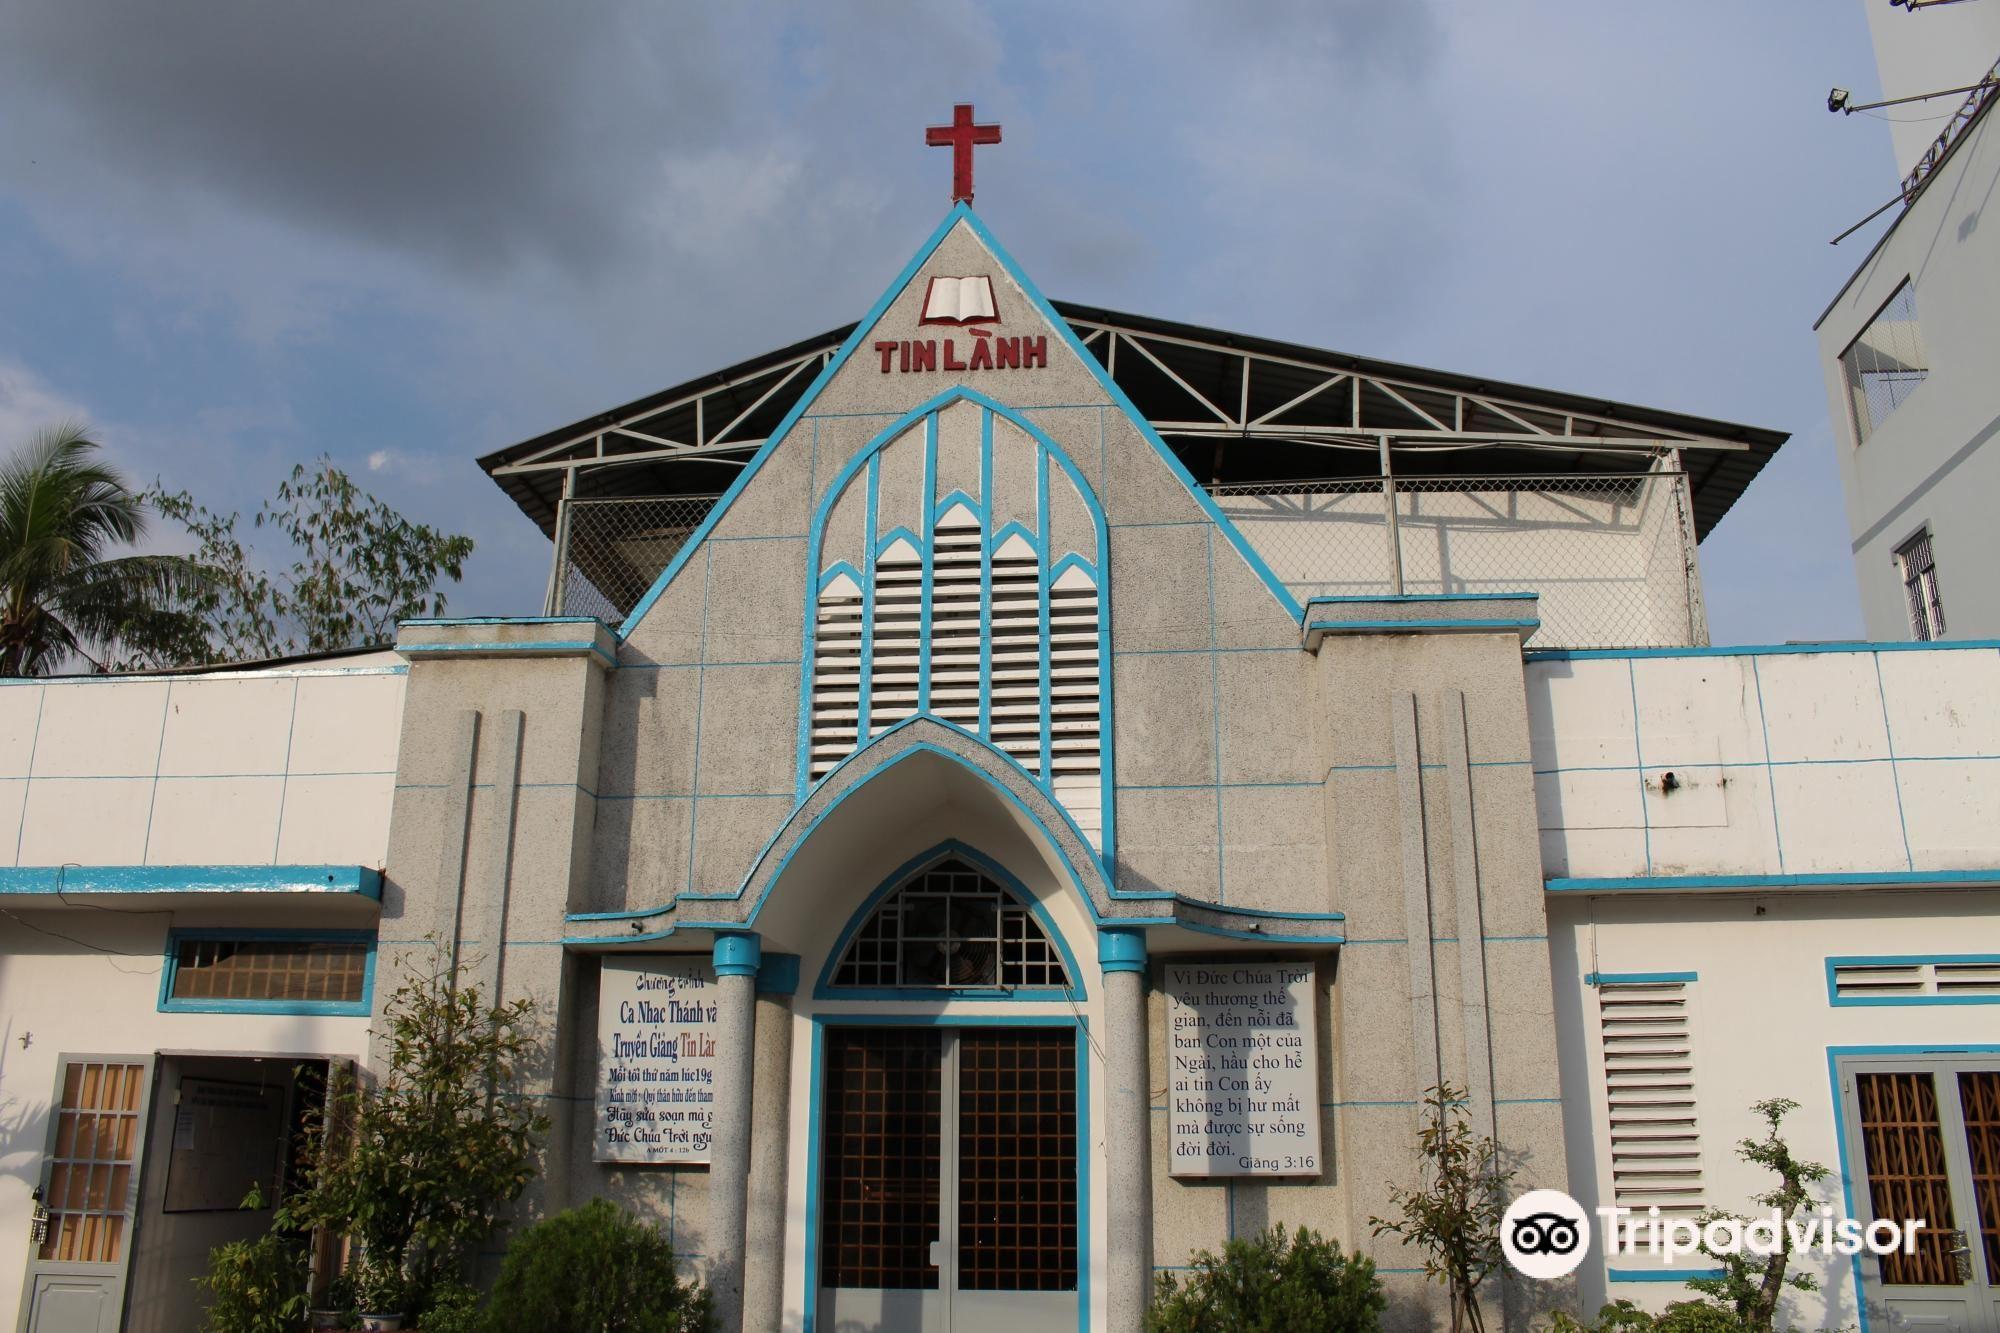 Tin Lanh Baptist Church